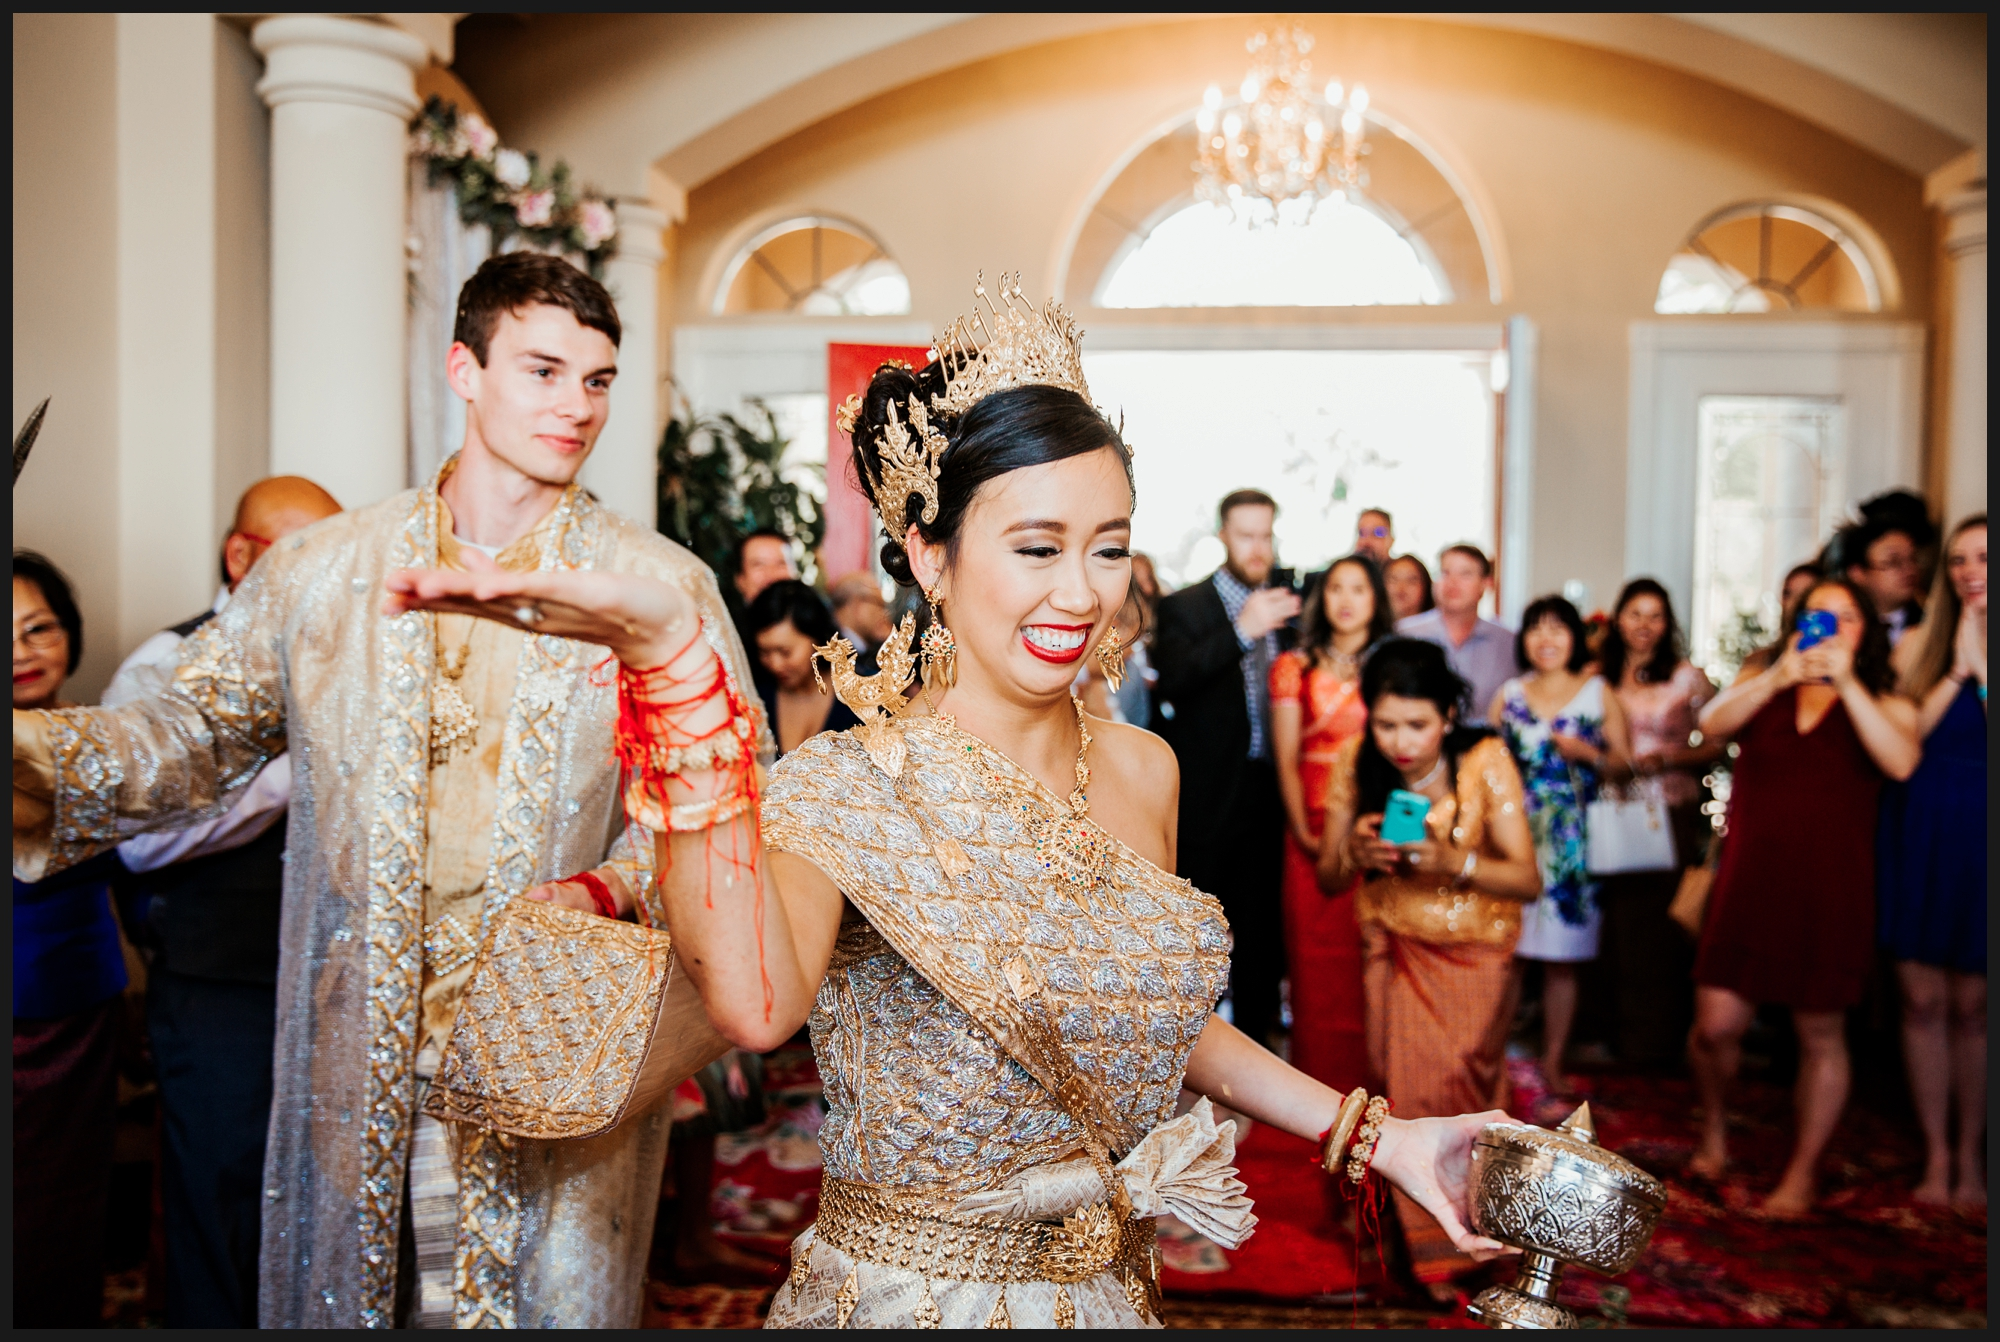 Orlando-Wedding-Photographer-destination-wedding-photographer-florida-wedding-photographer-bohemian-wedding-photographer_1382.jpg